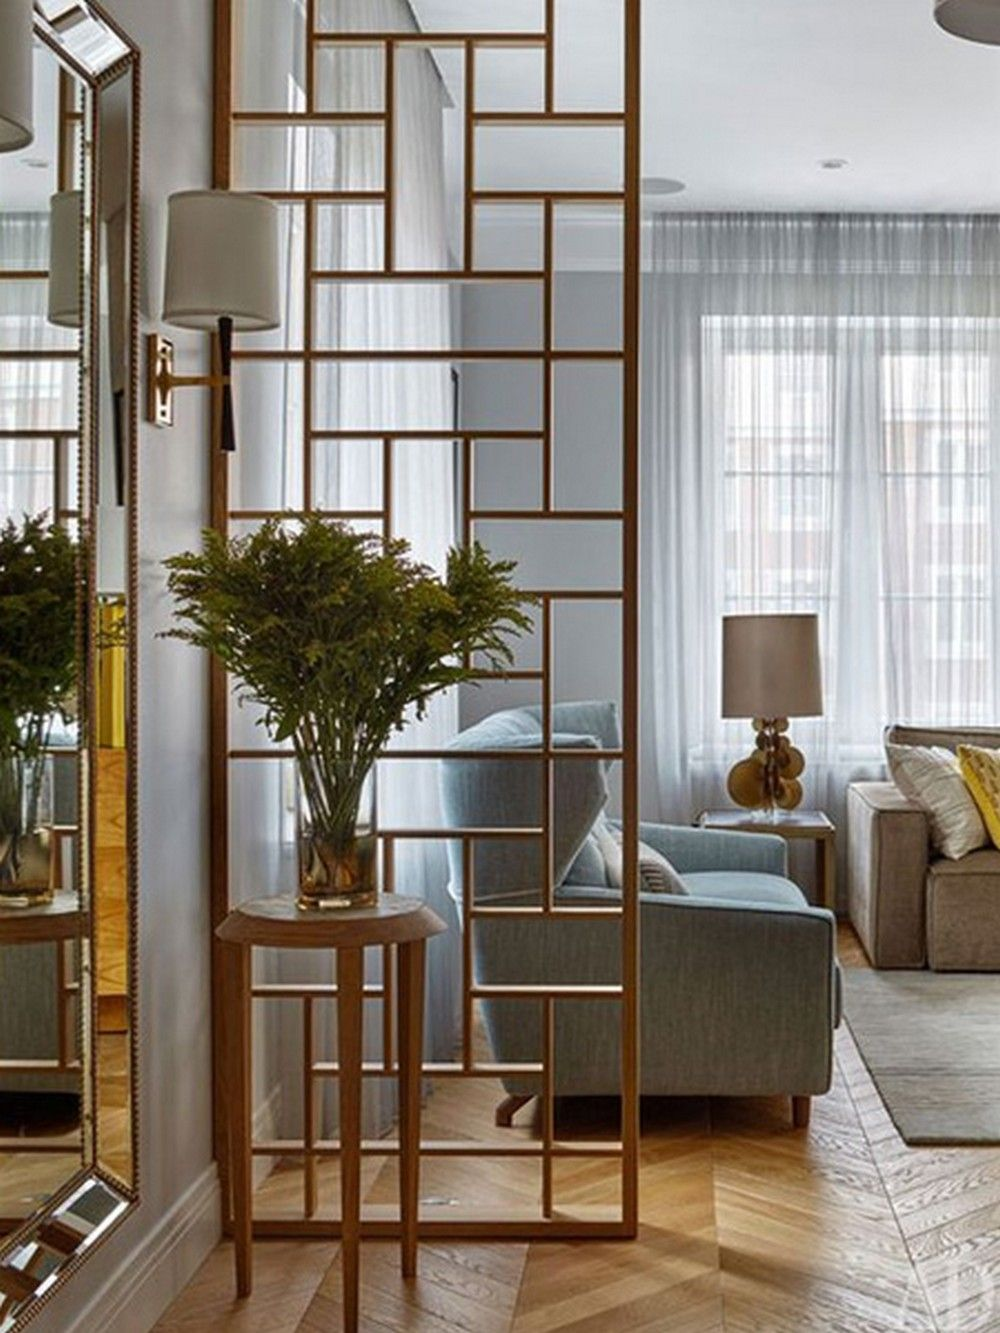 Cool 26 Simple Living Room Interior Design Https Homedecort C